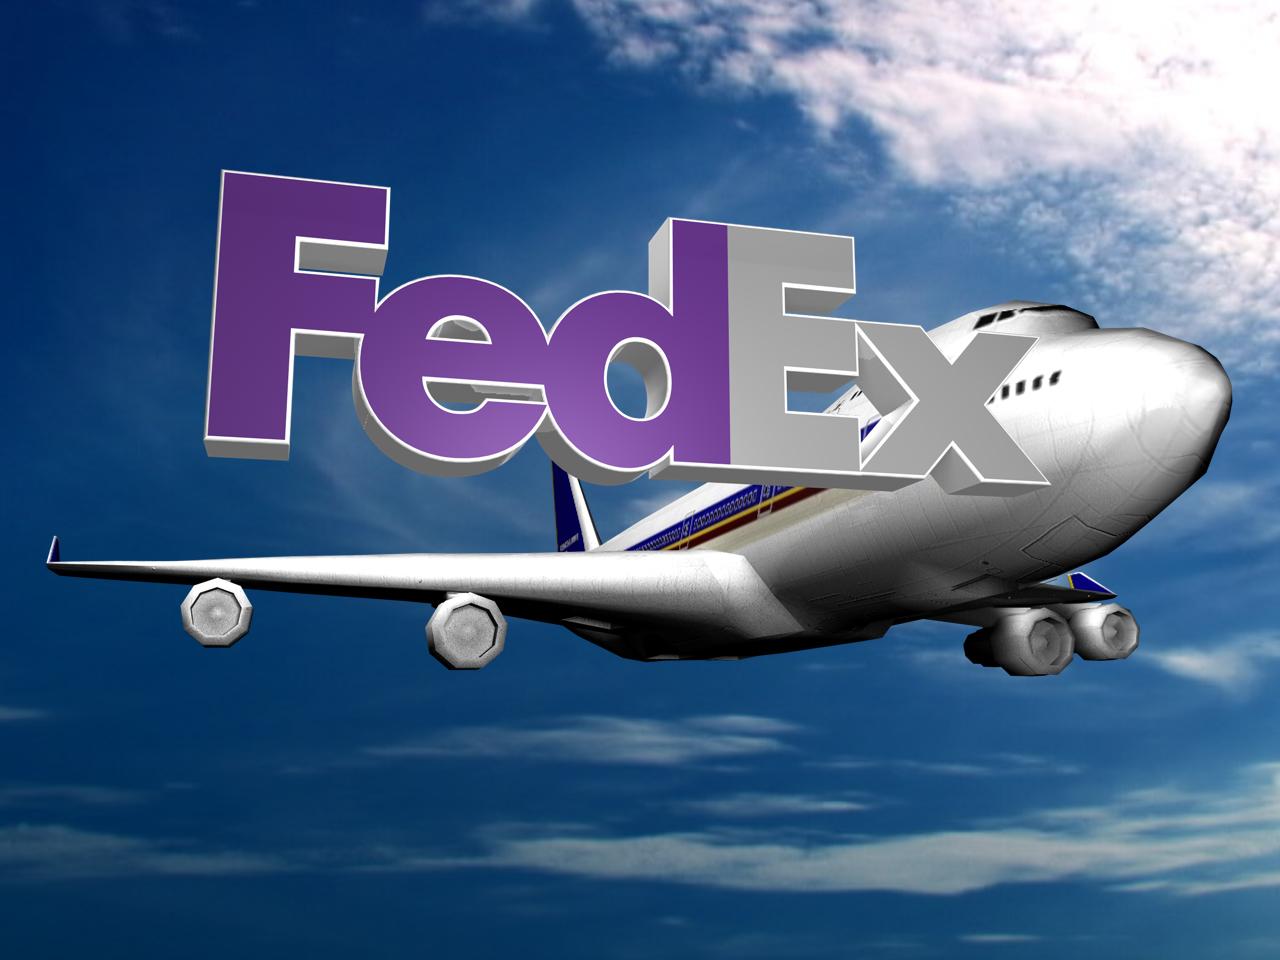 fedex: